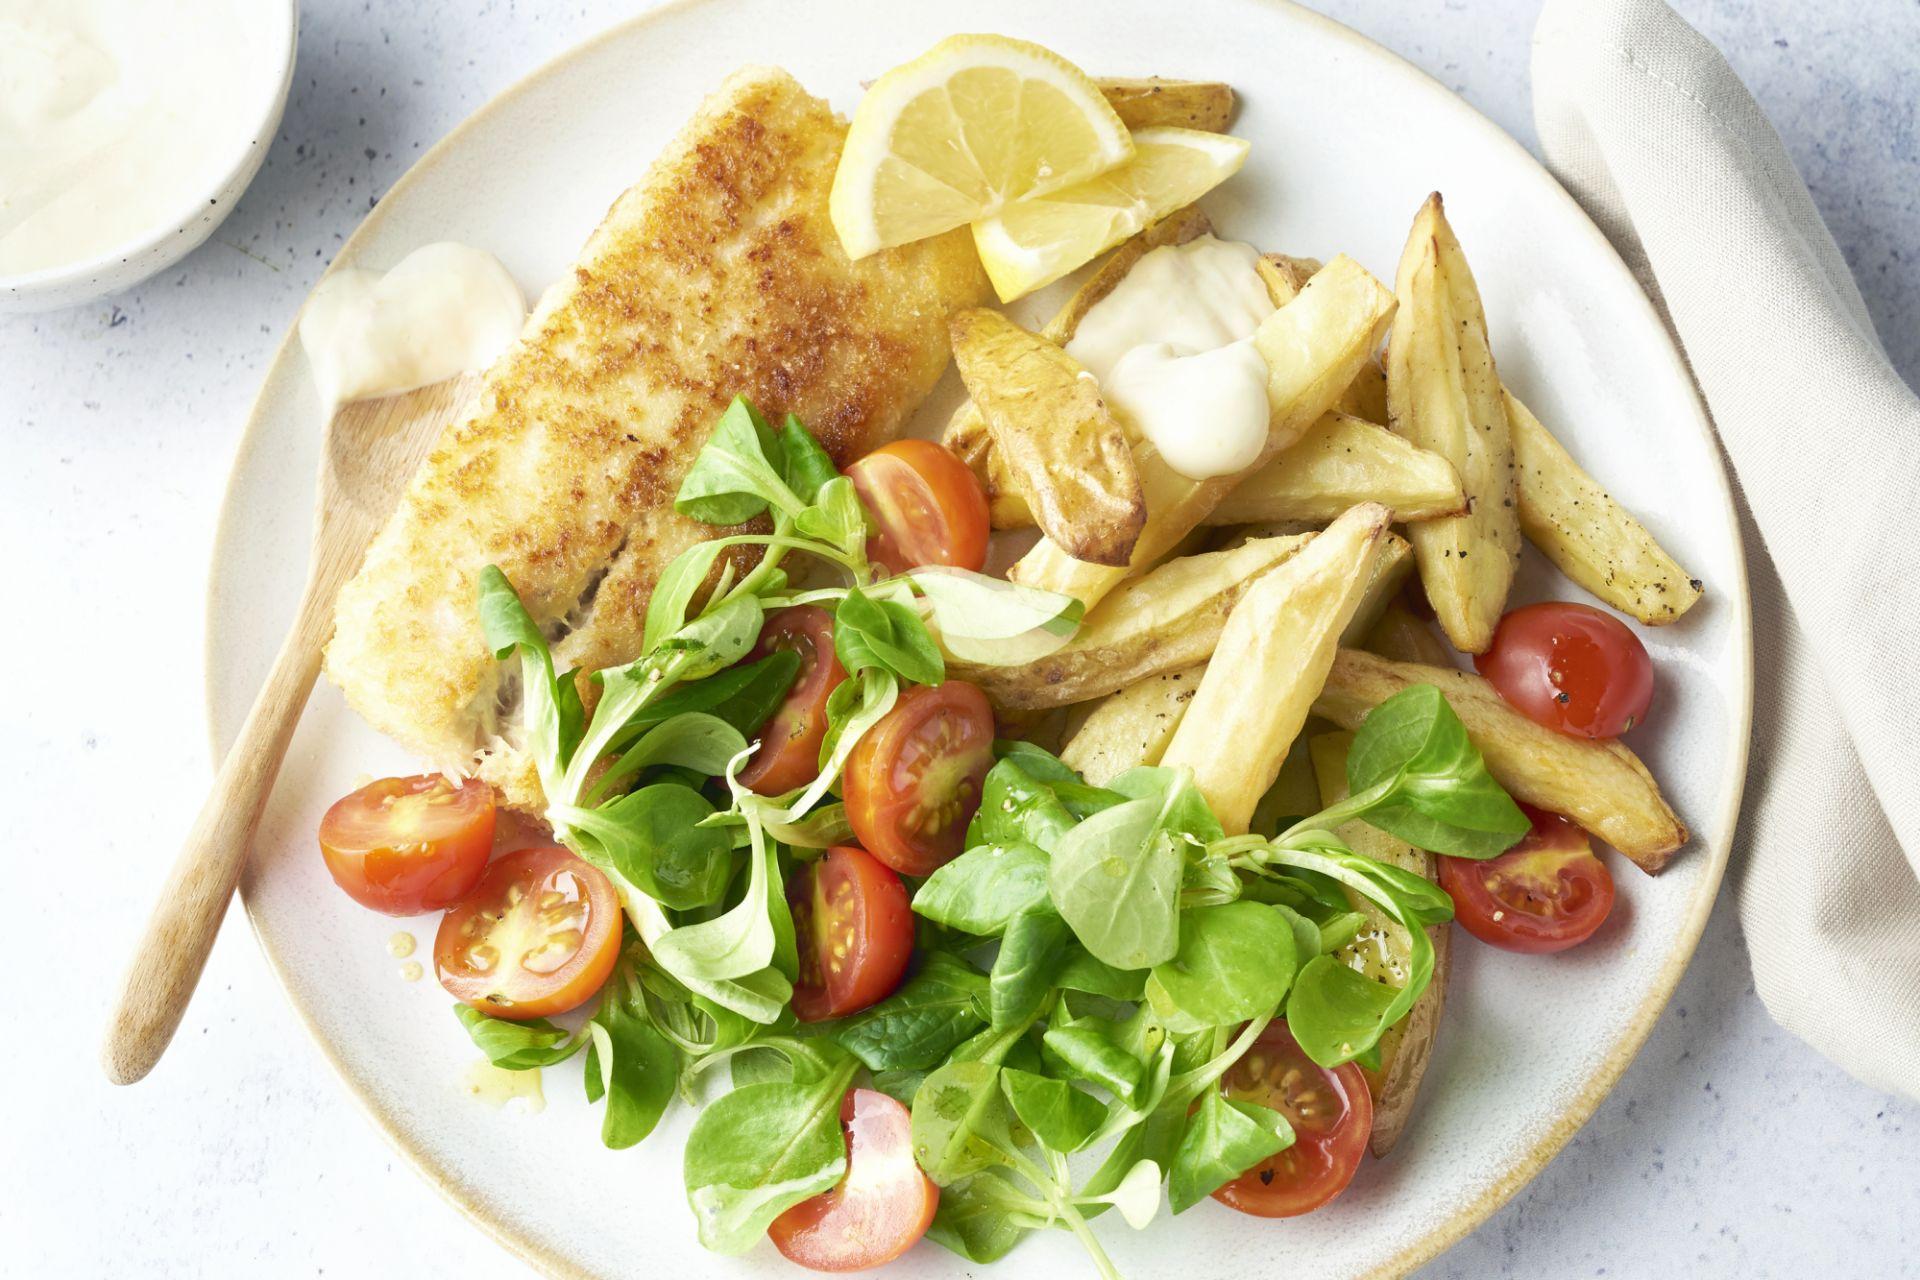 Fish & chips met citroenmayonaise en salade